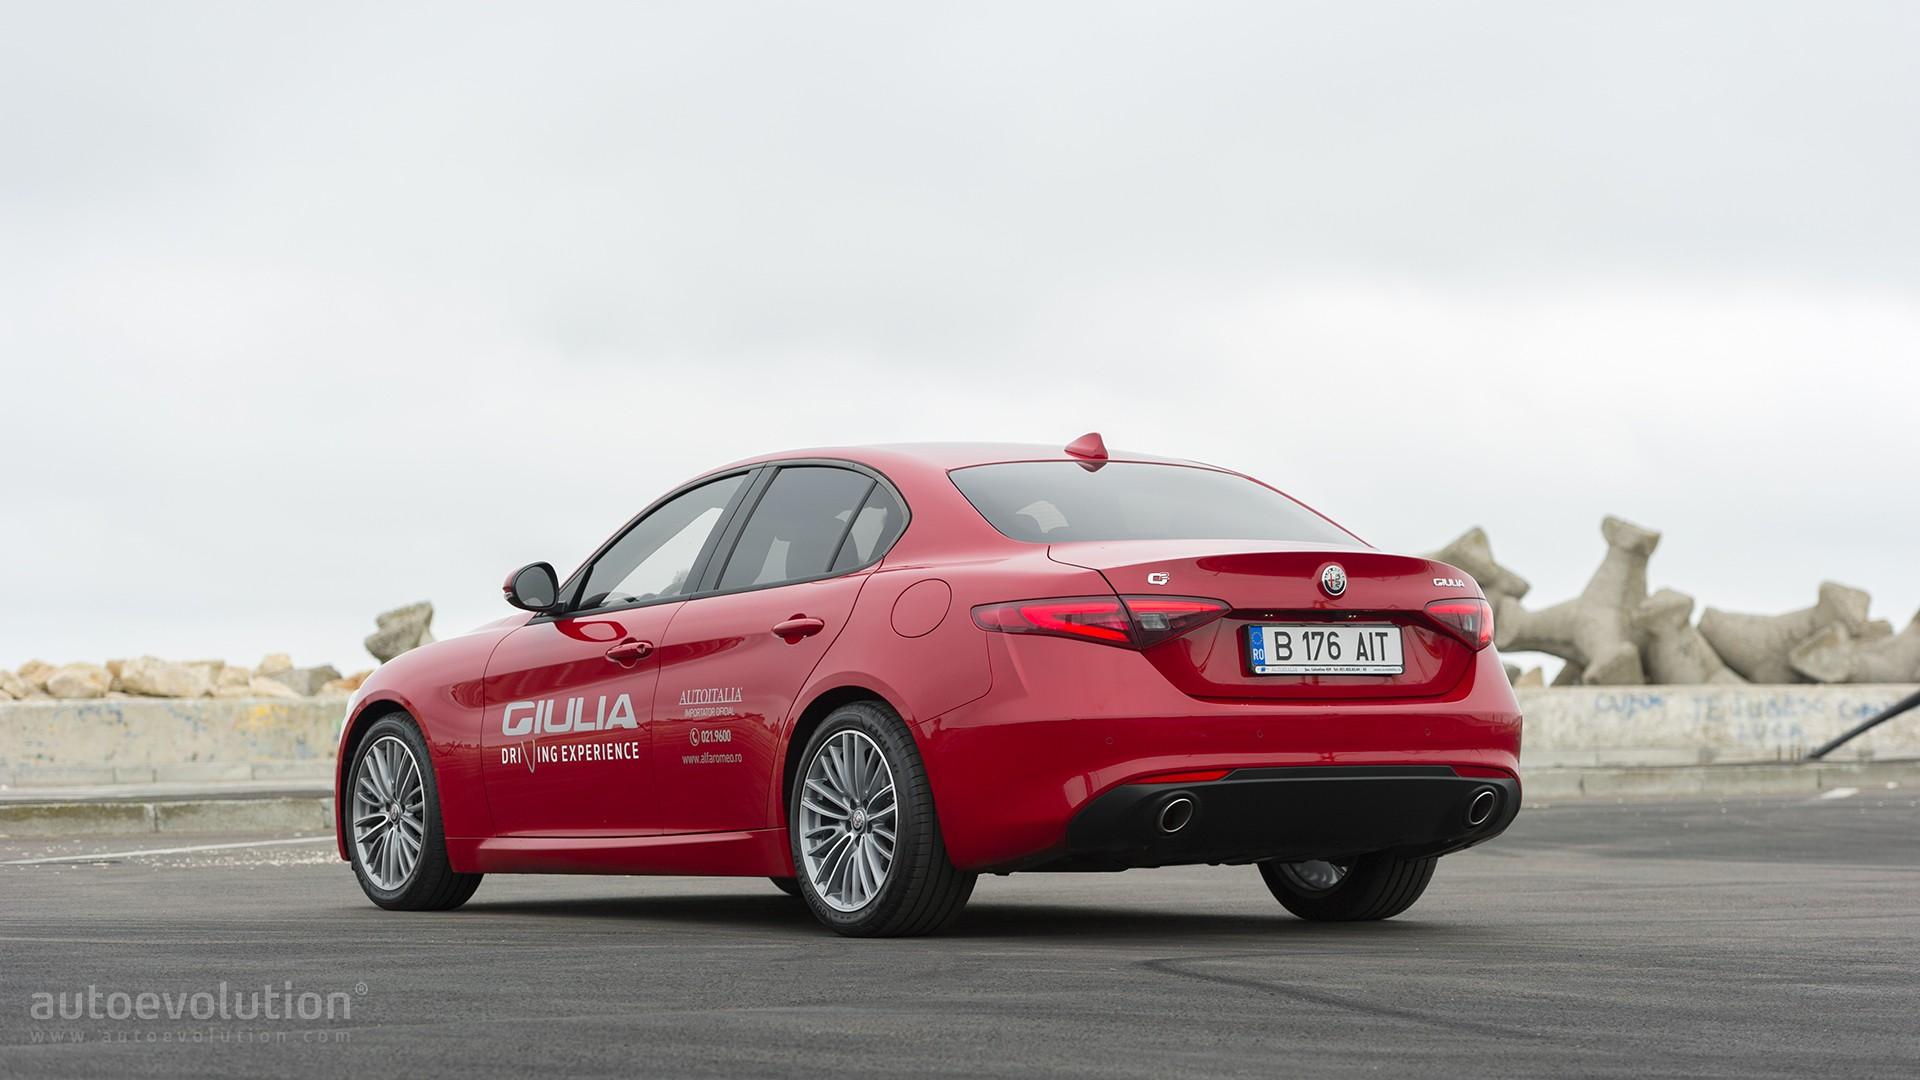 Alfa Romeo Drops New 8C Supercar, GTV Sports Car From